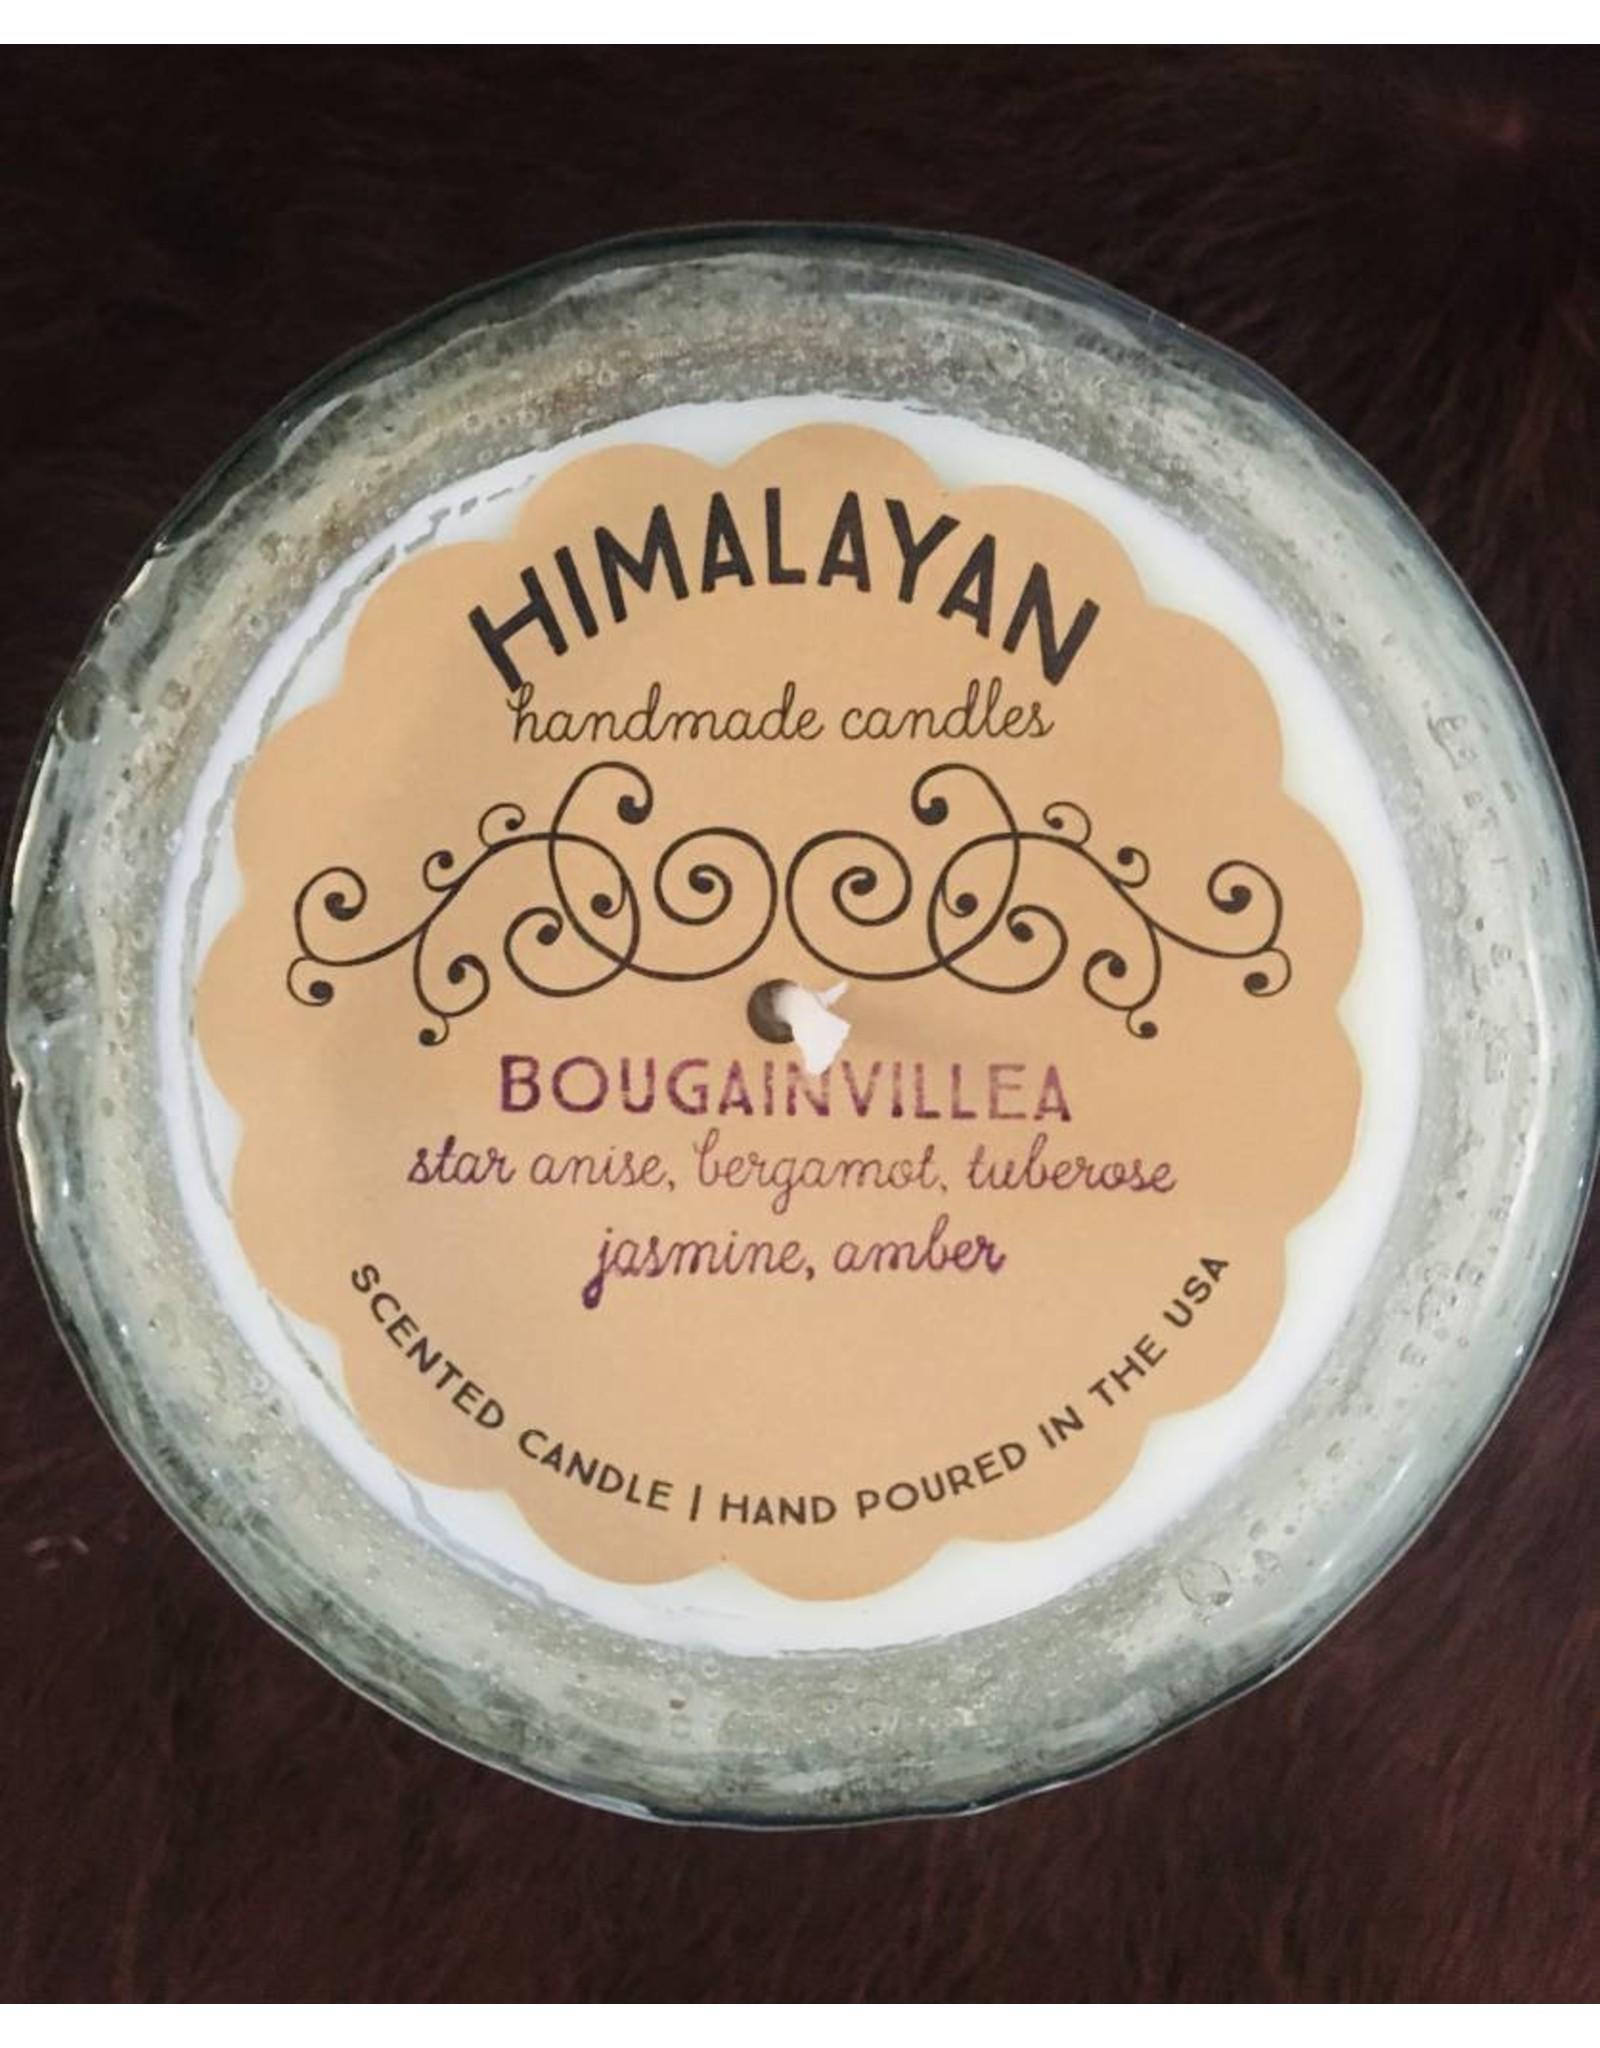 Himalayan Clear-Bougainvillea